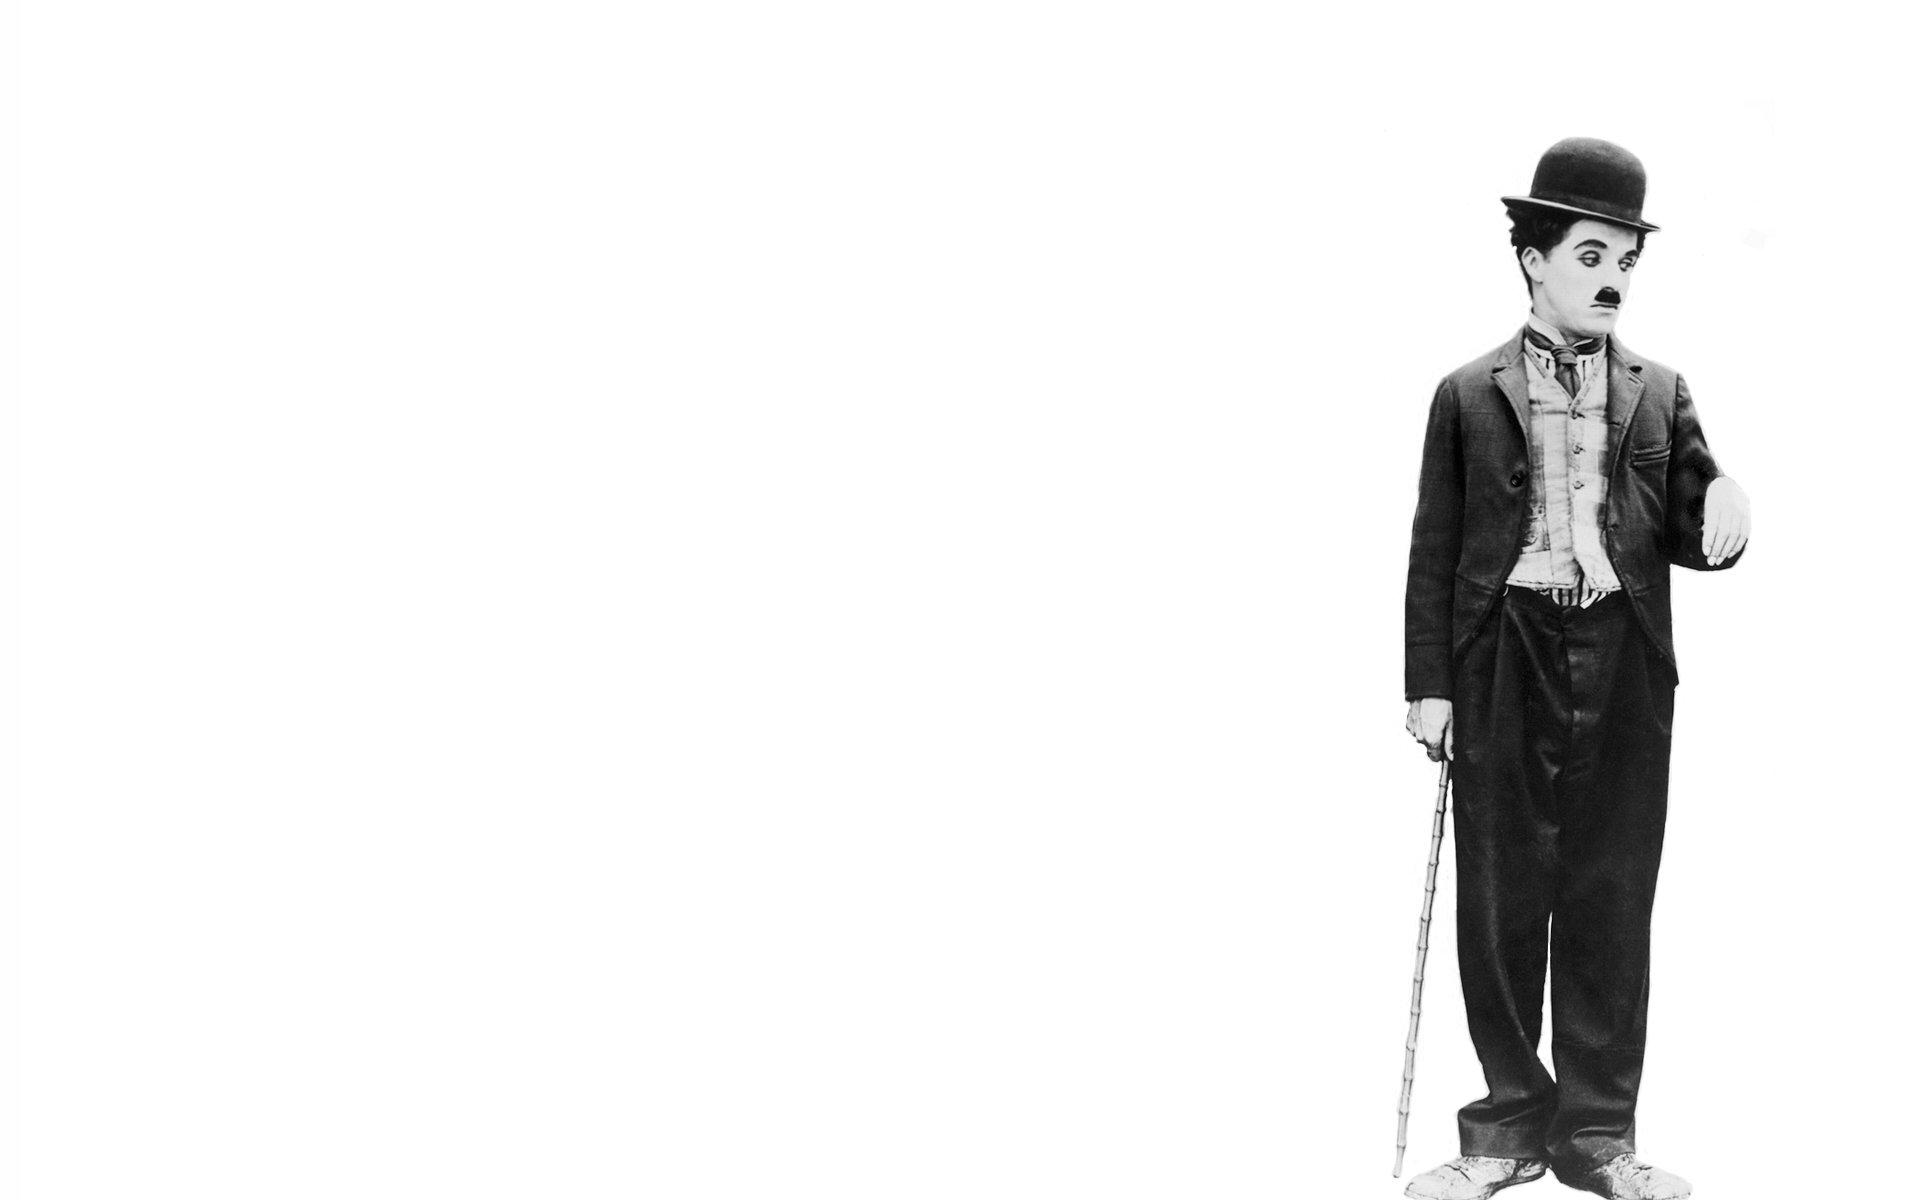 Charlie Chaplin HD Wallpaper Background Image 1920x1200 ID 1920x1200